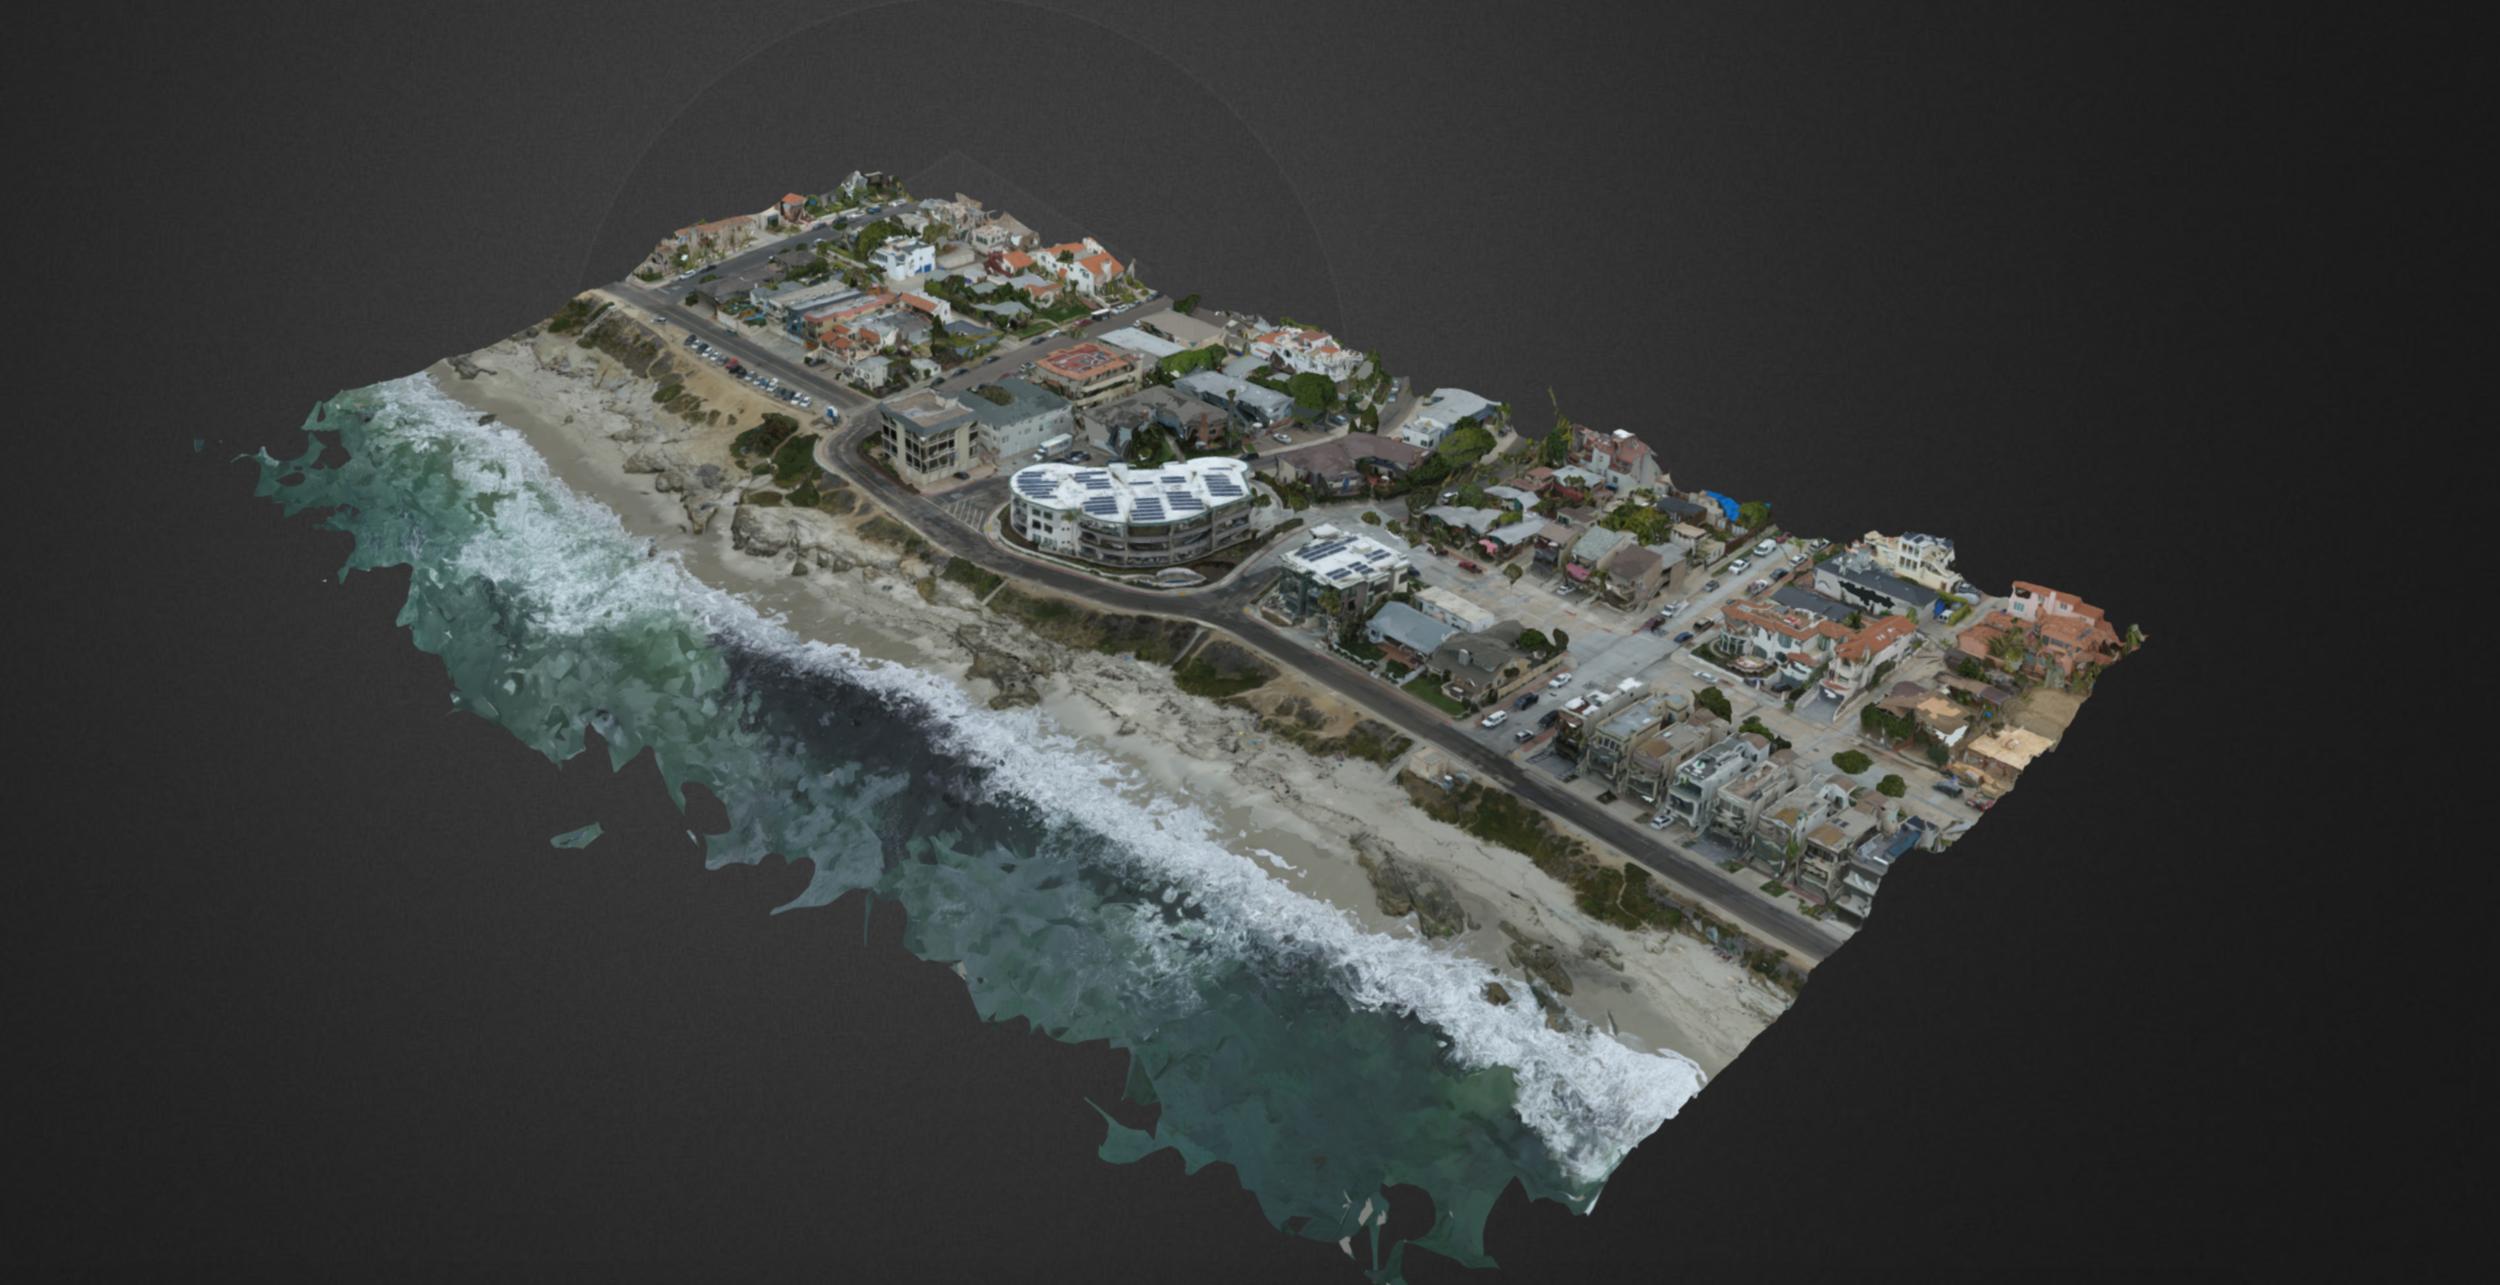 3D model of windansea beach, la jolla, california